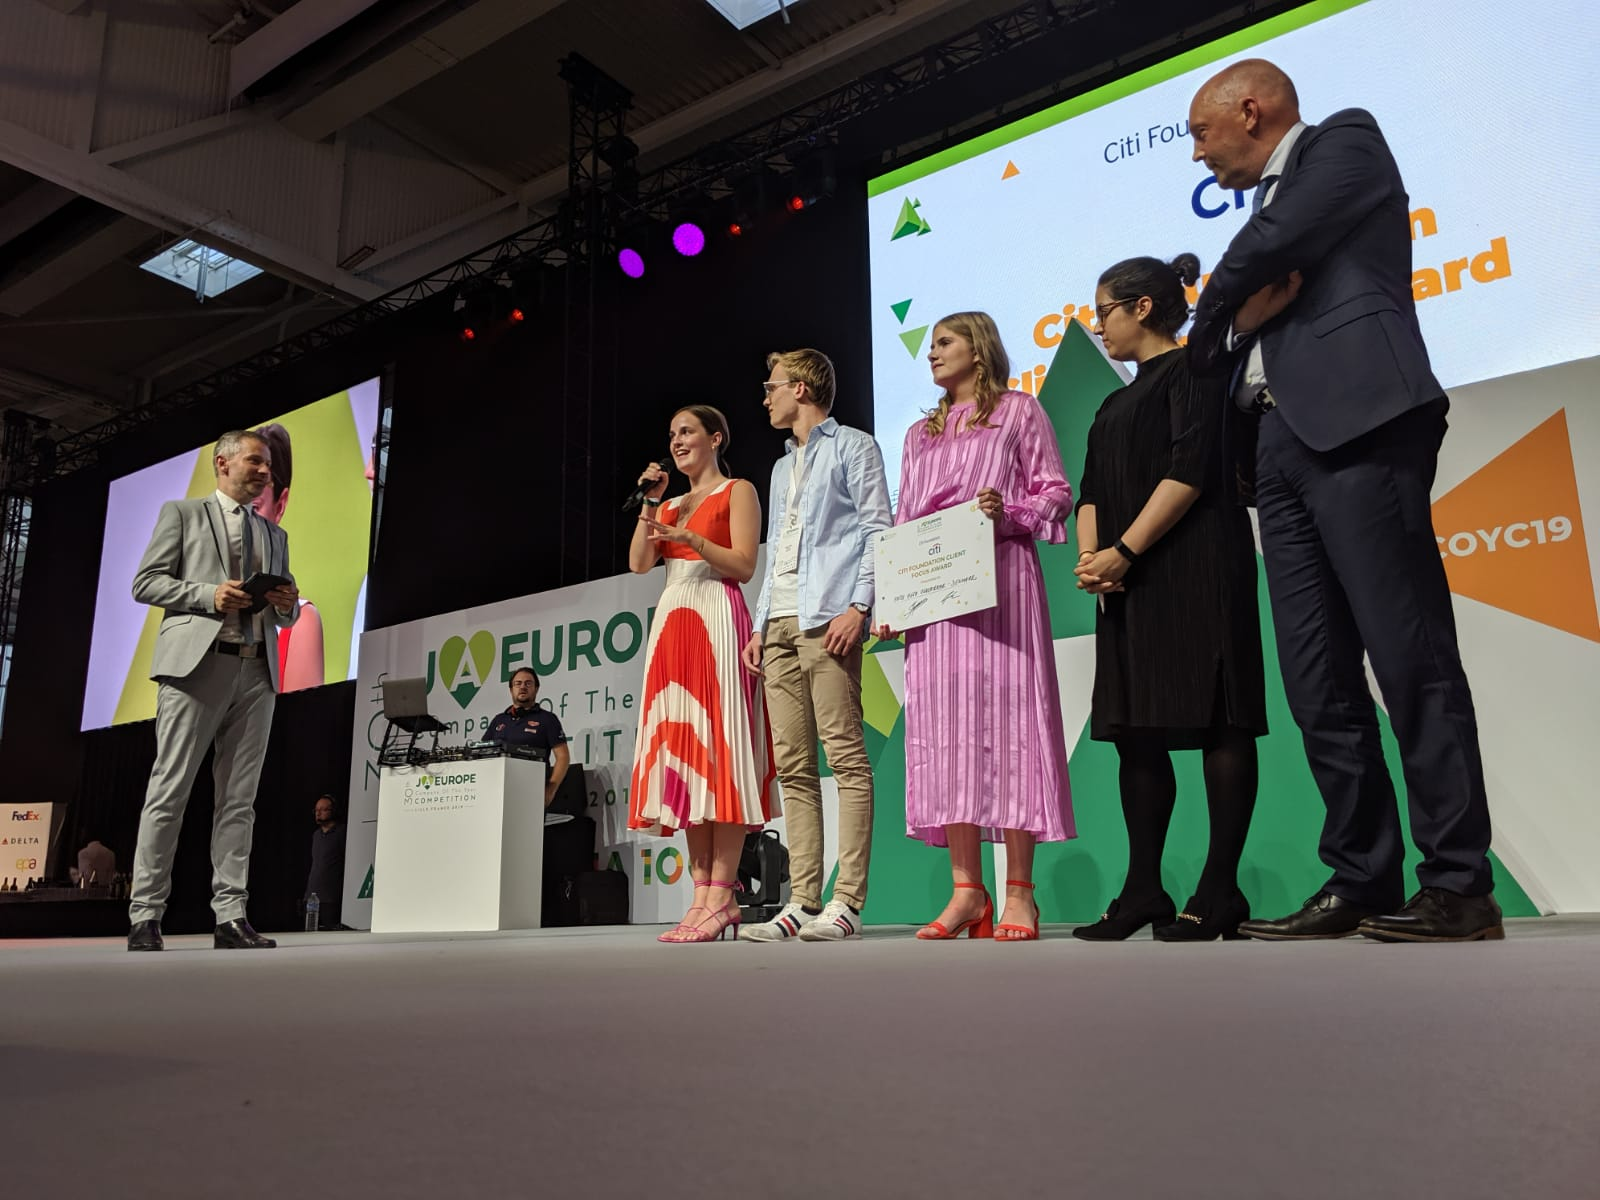 Hush-Hush Underwear, winner of the 2019 Citi Foundation Client Focus Award.